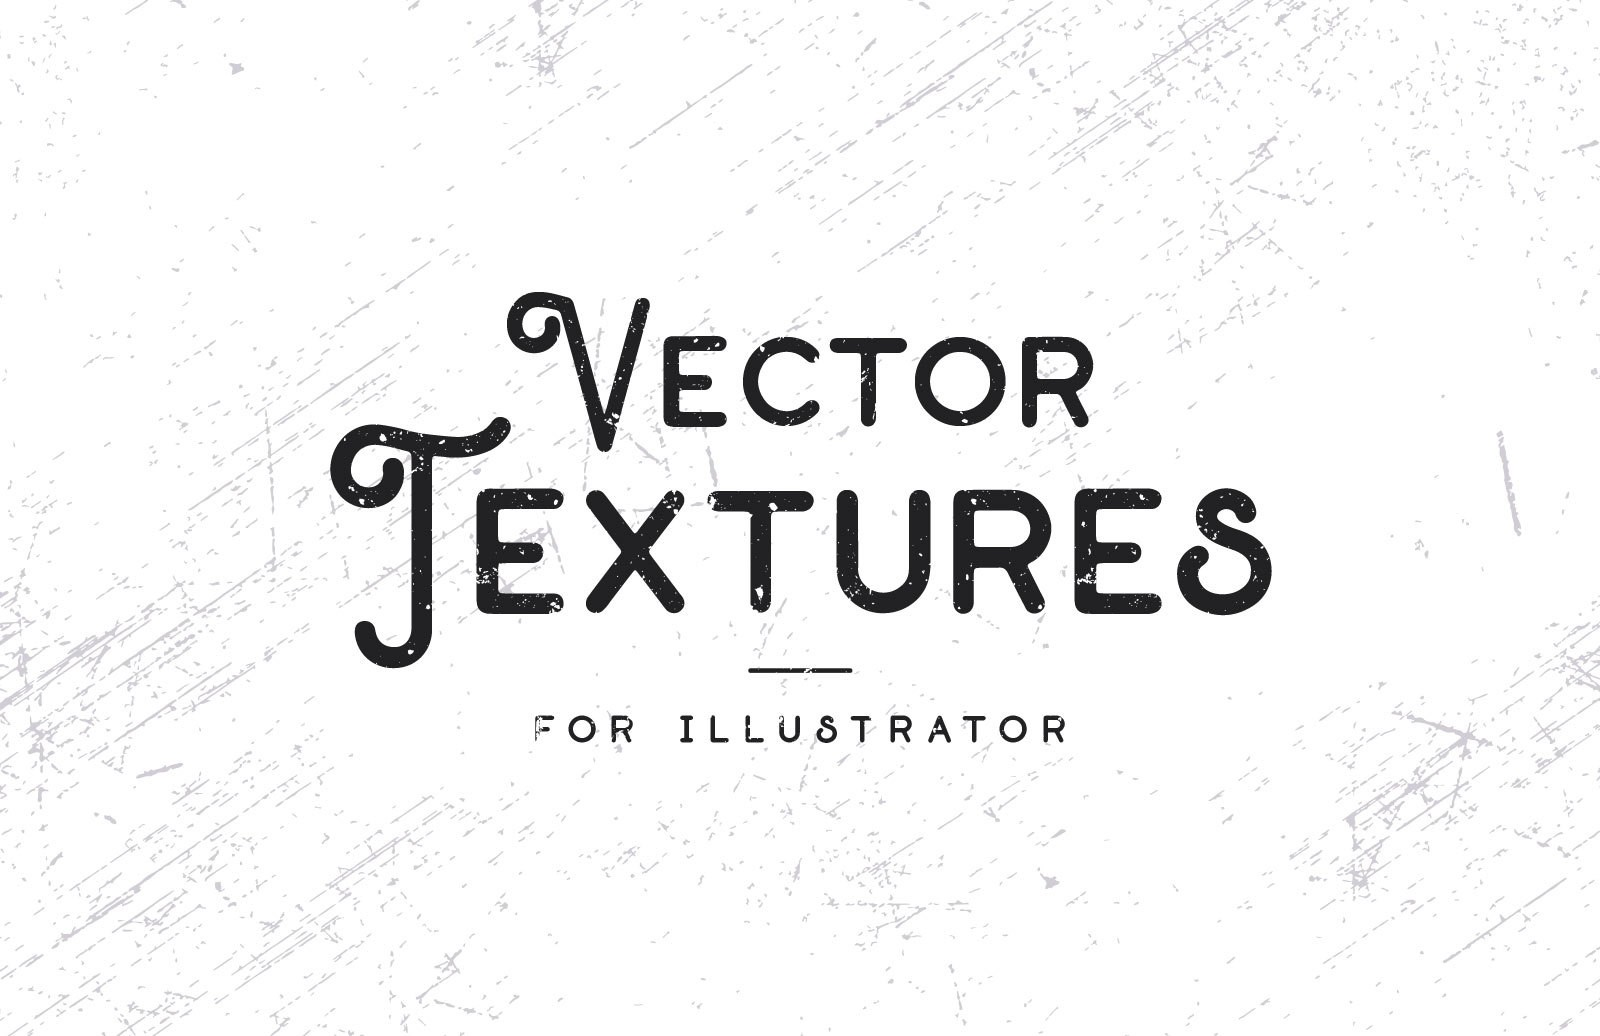 Free Illustrator Vector Textures